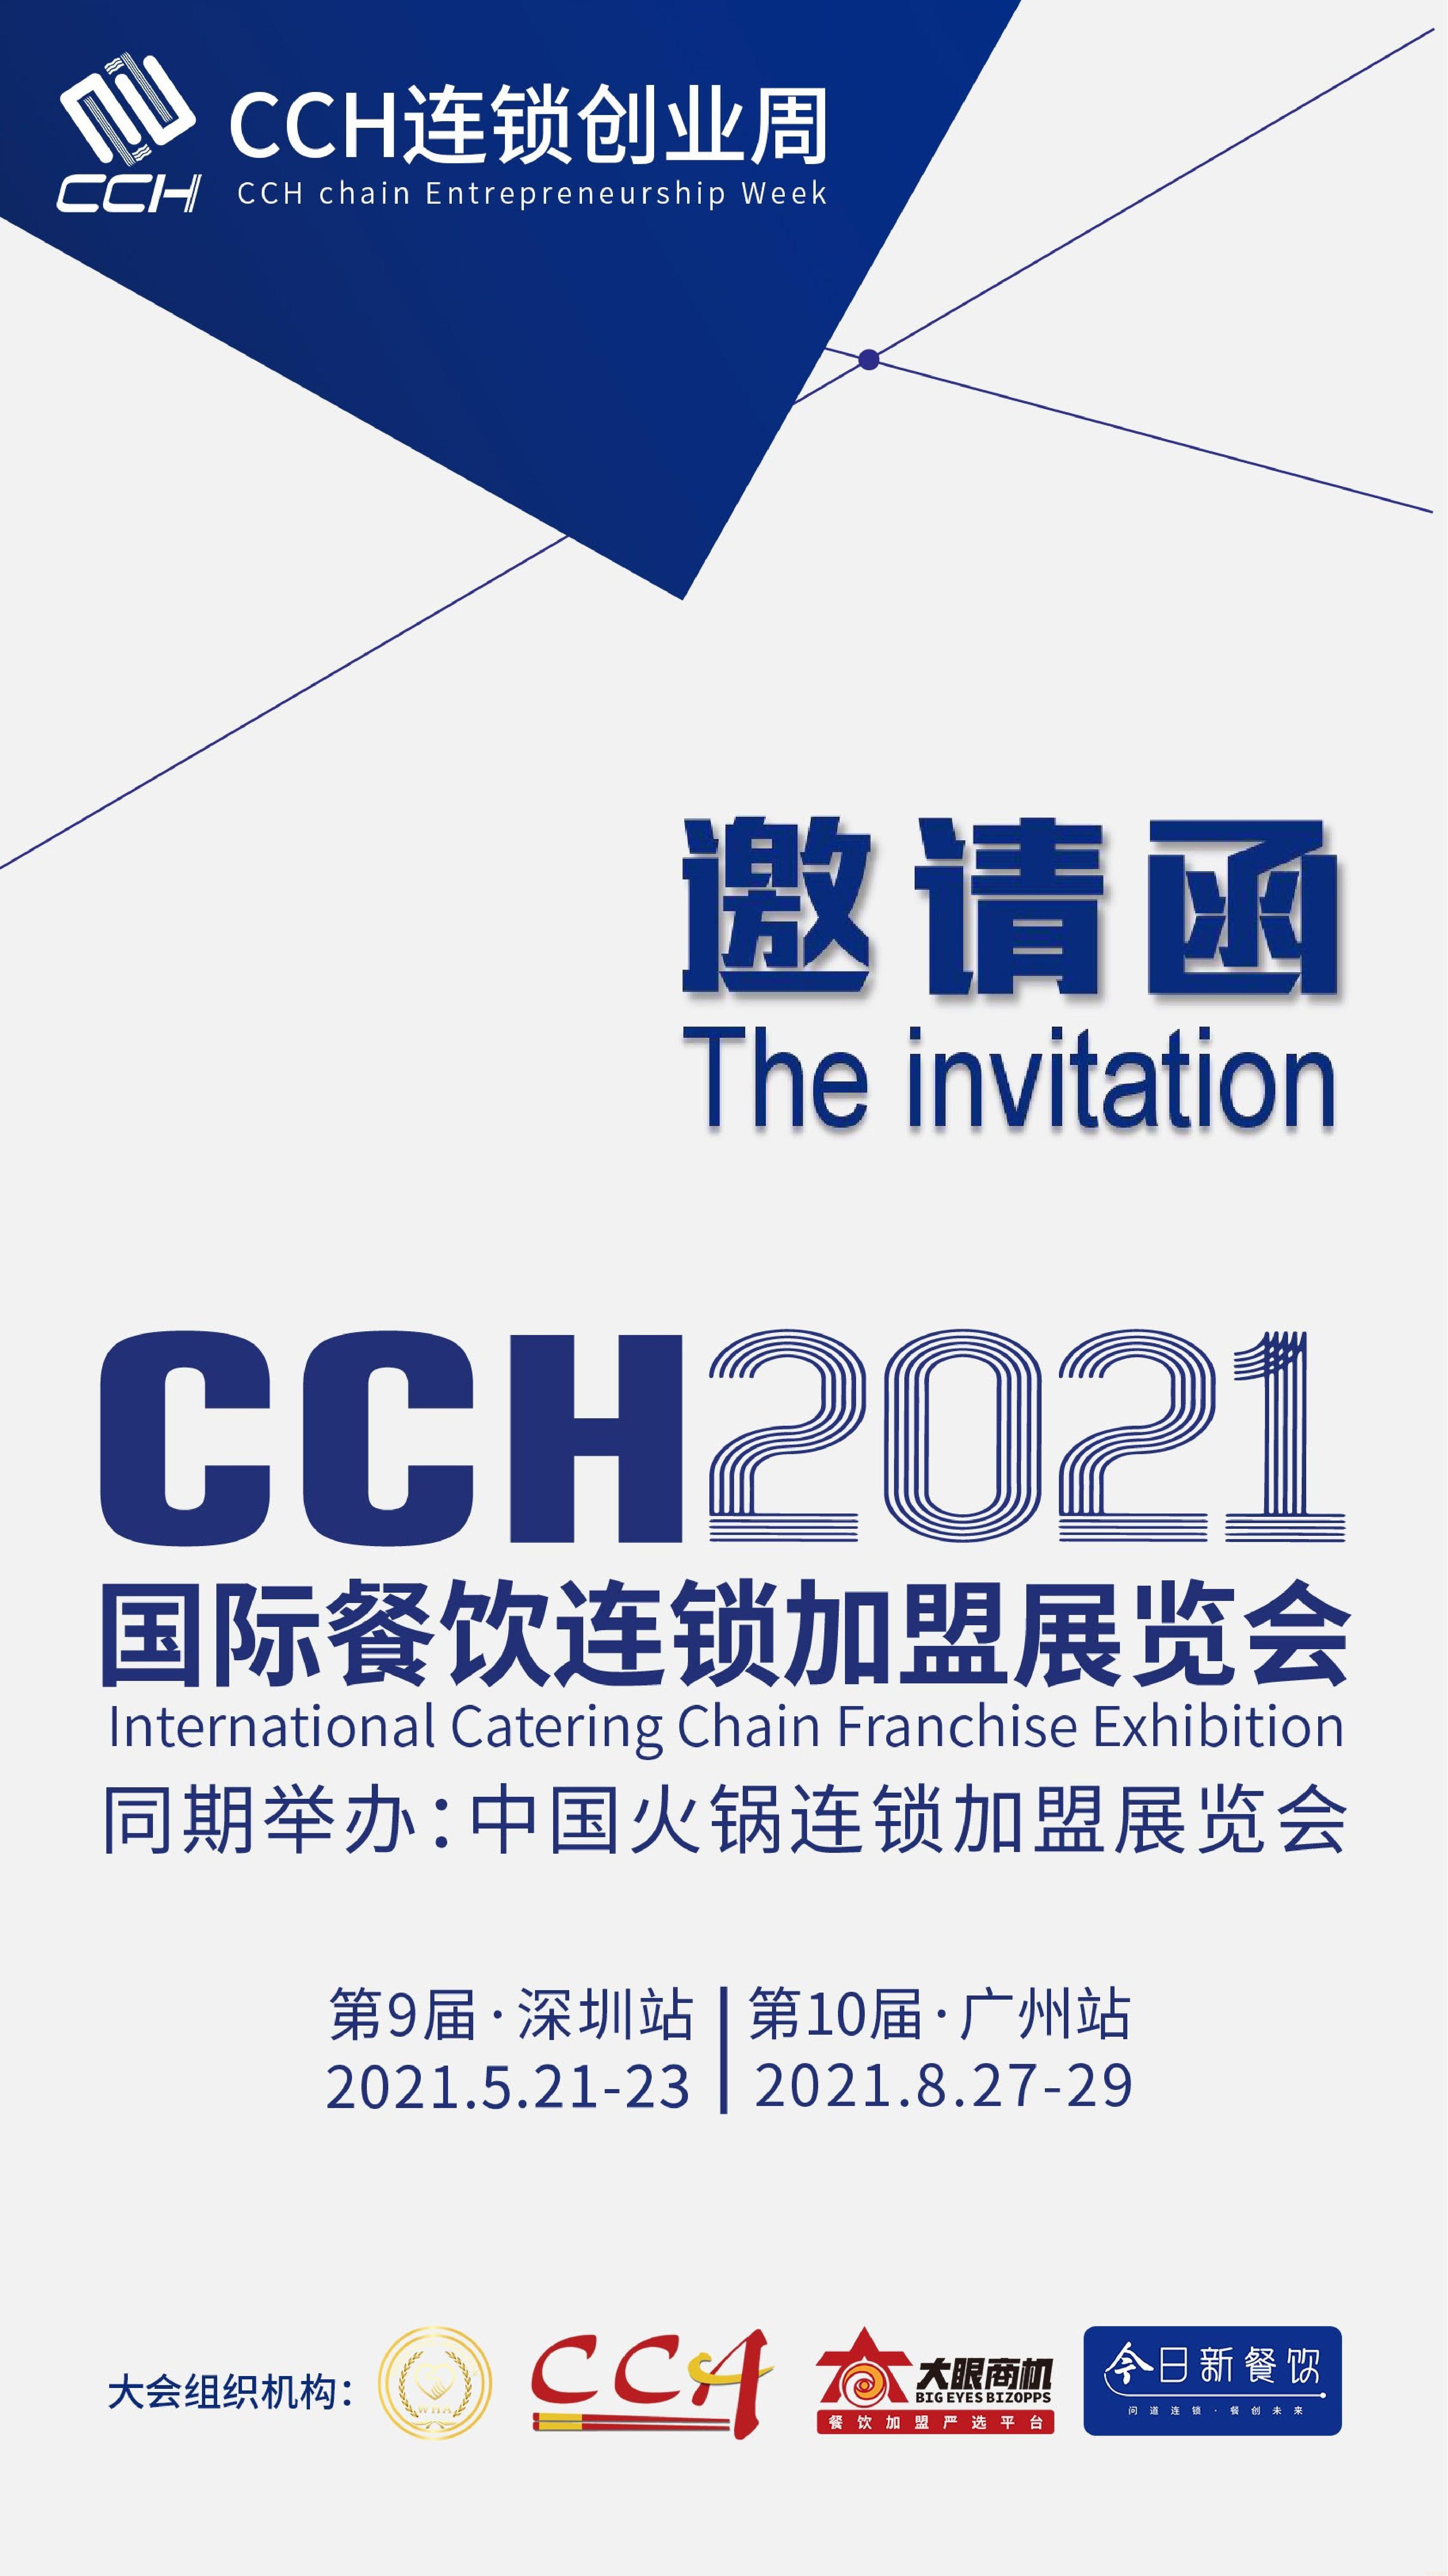 CCH2021-餐饮邀请函·赵(2)(1)-001.jpg